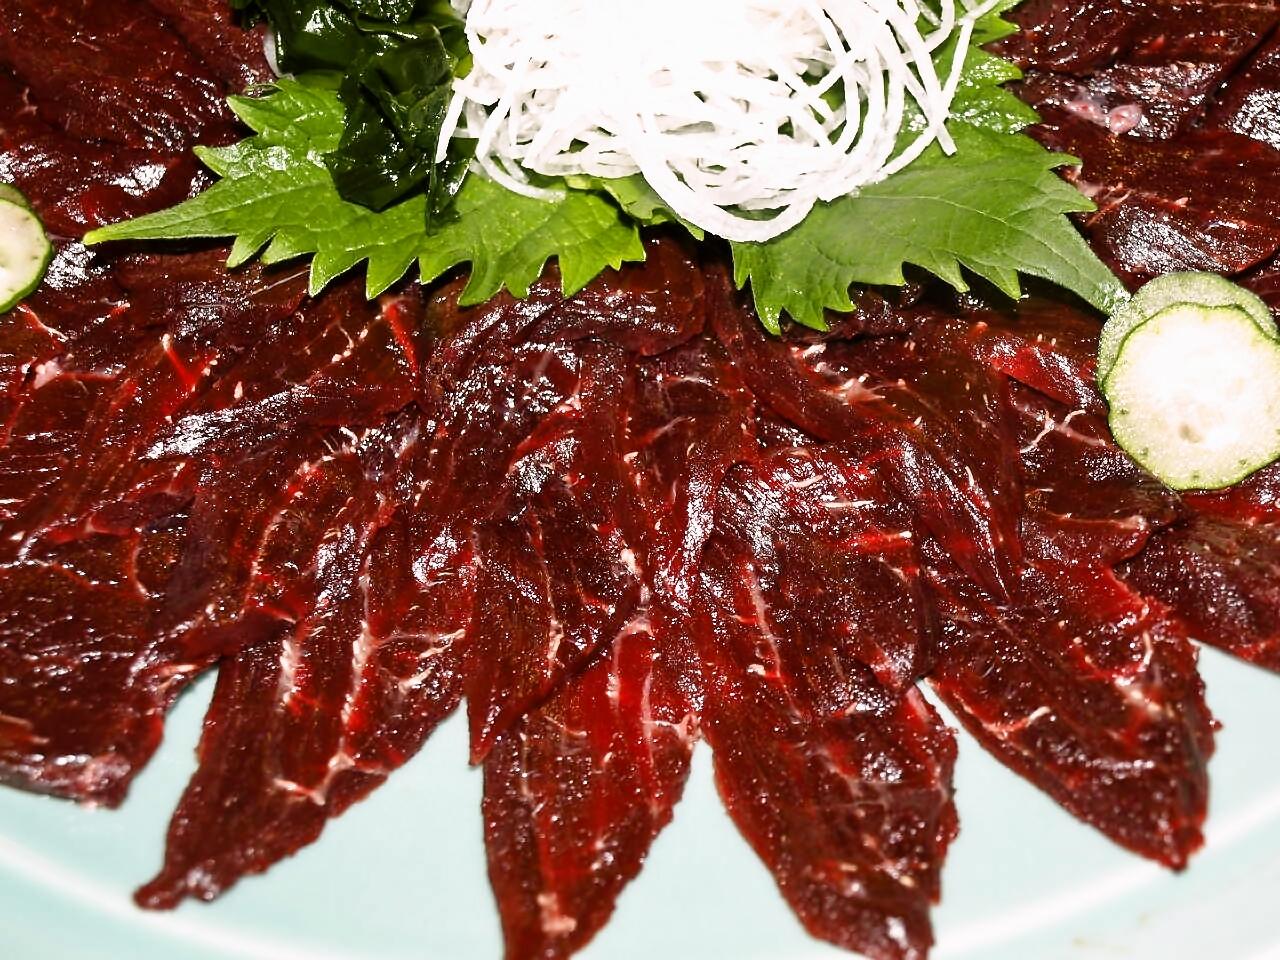 熟成赤肉(お刺身用)